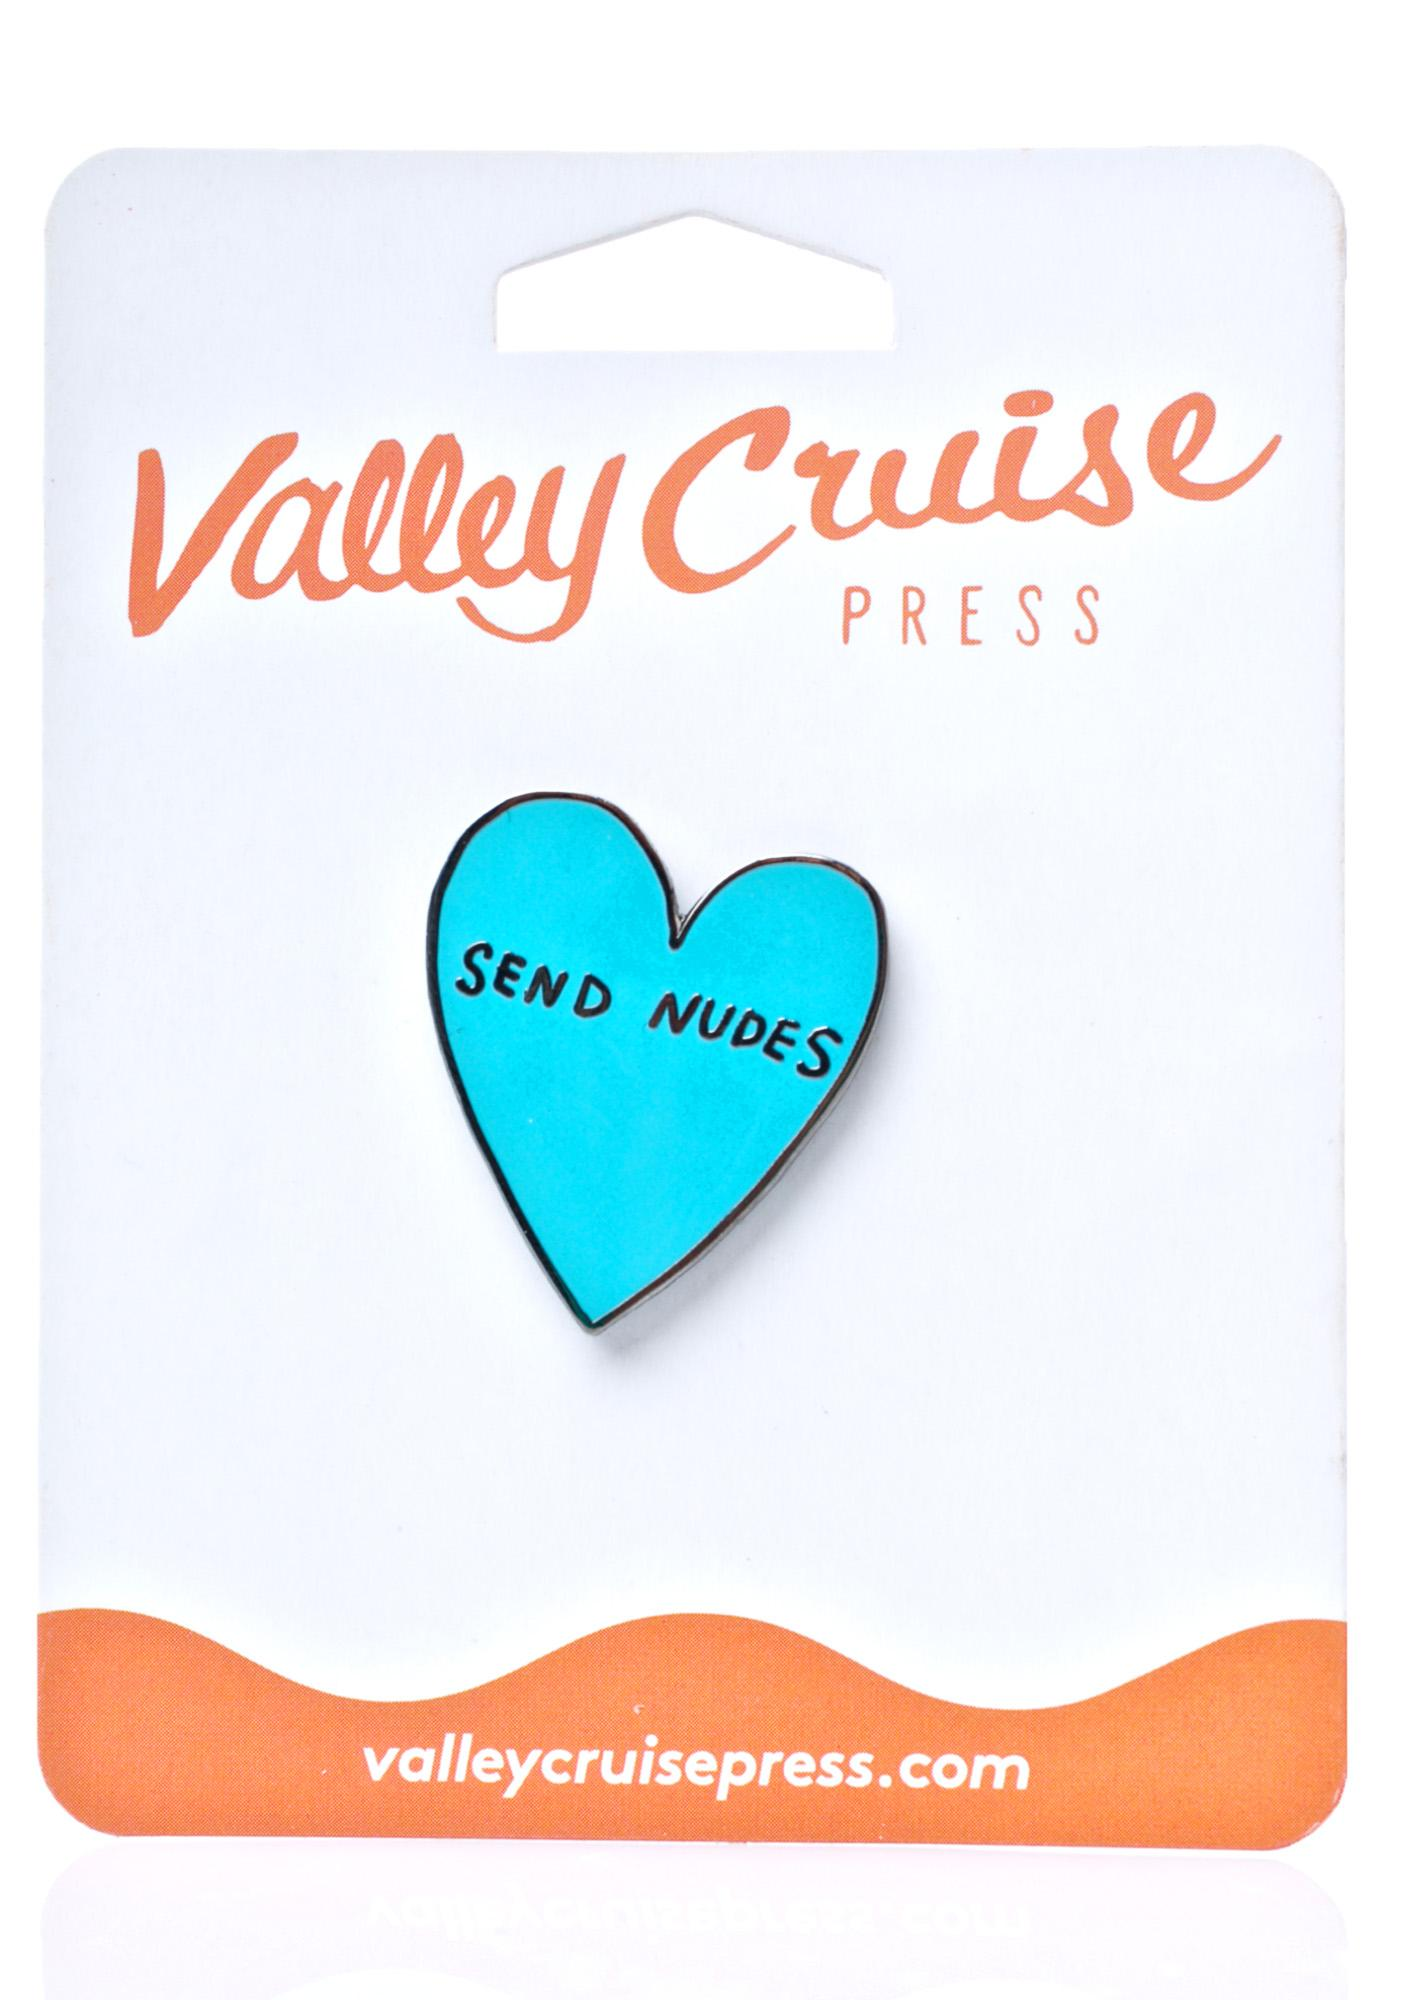 Valley Cruise Press Send Nudes Enamel Pin